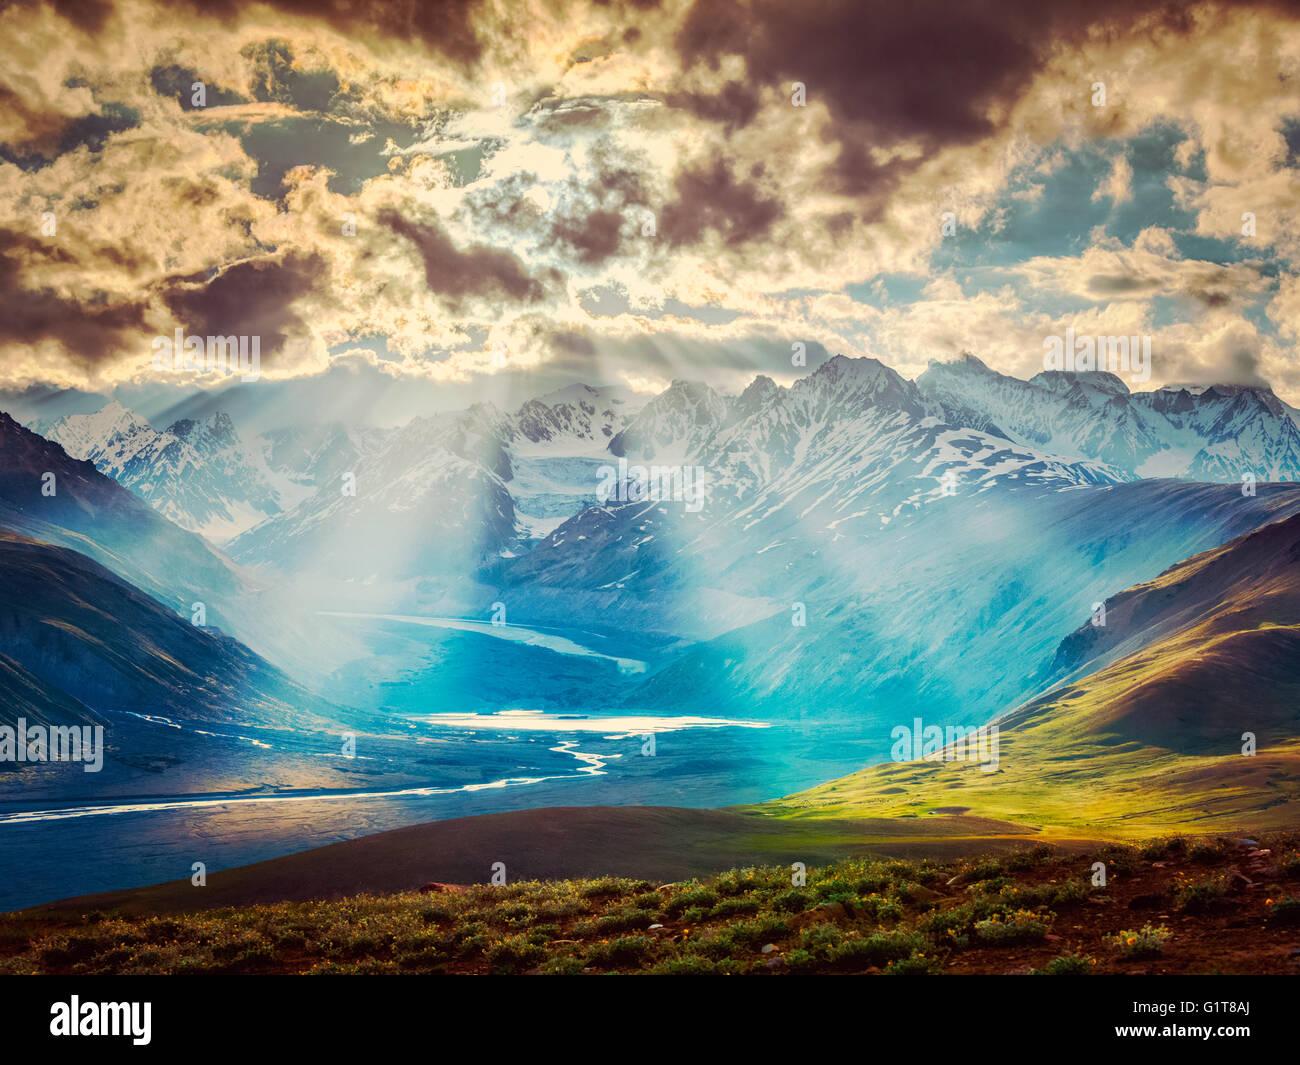 HImalayan landscape with Himalayas mountains - Stock Image